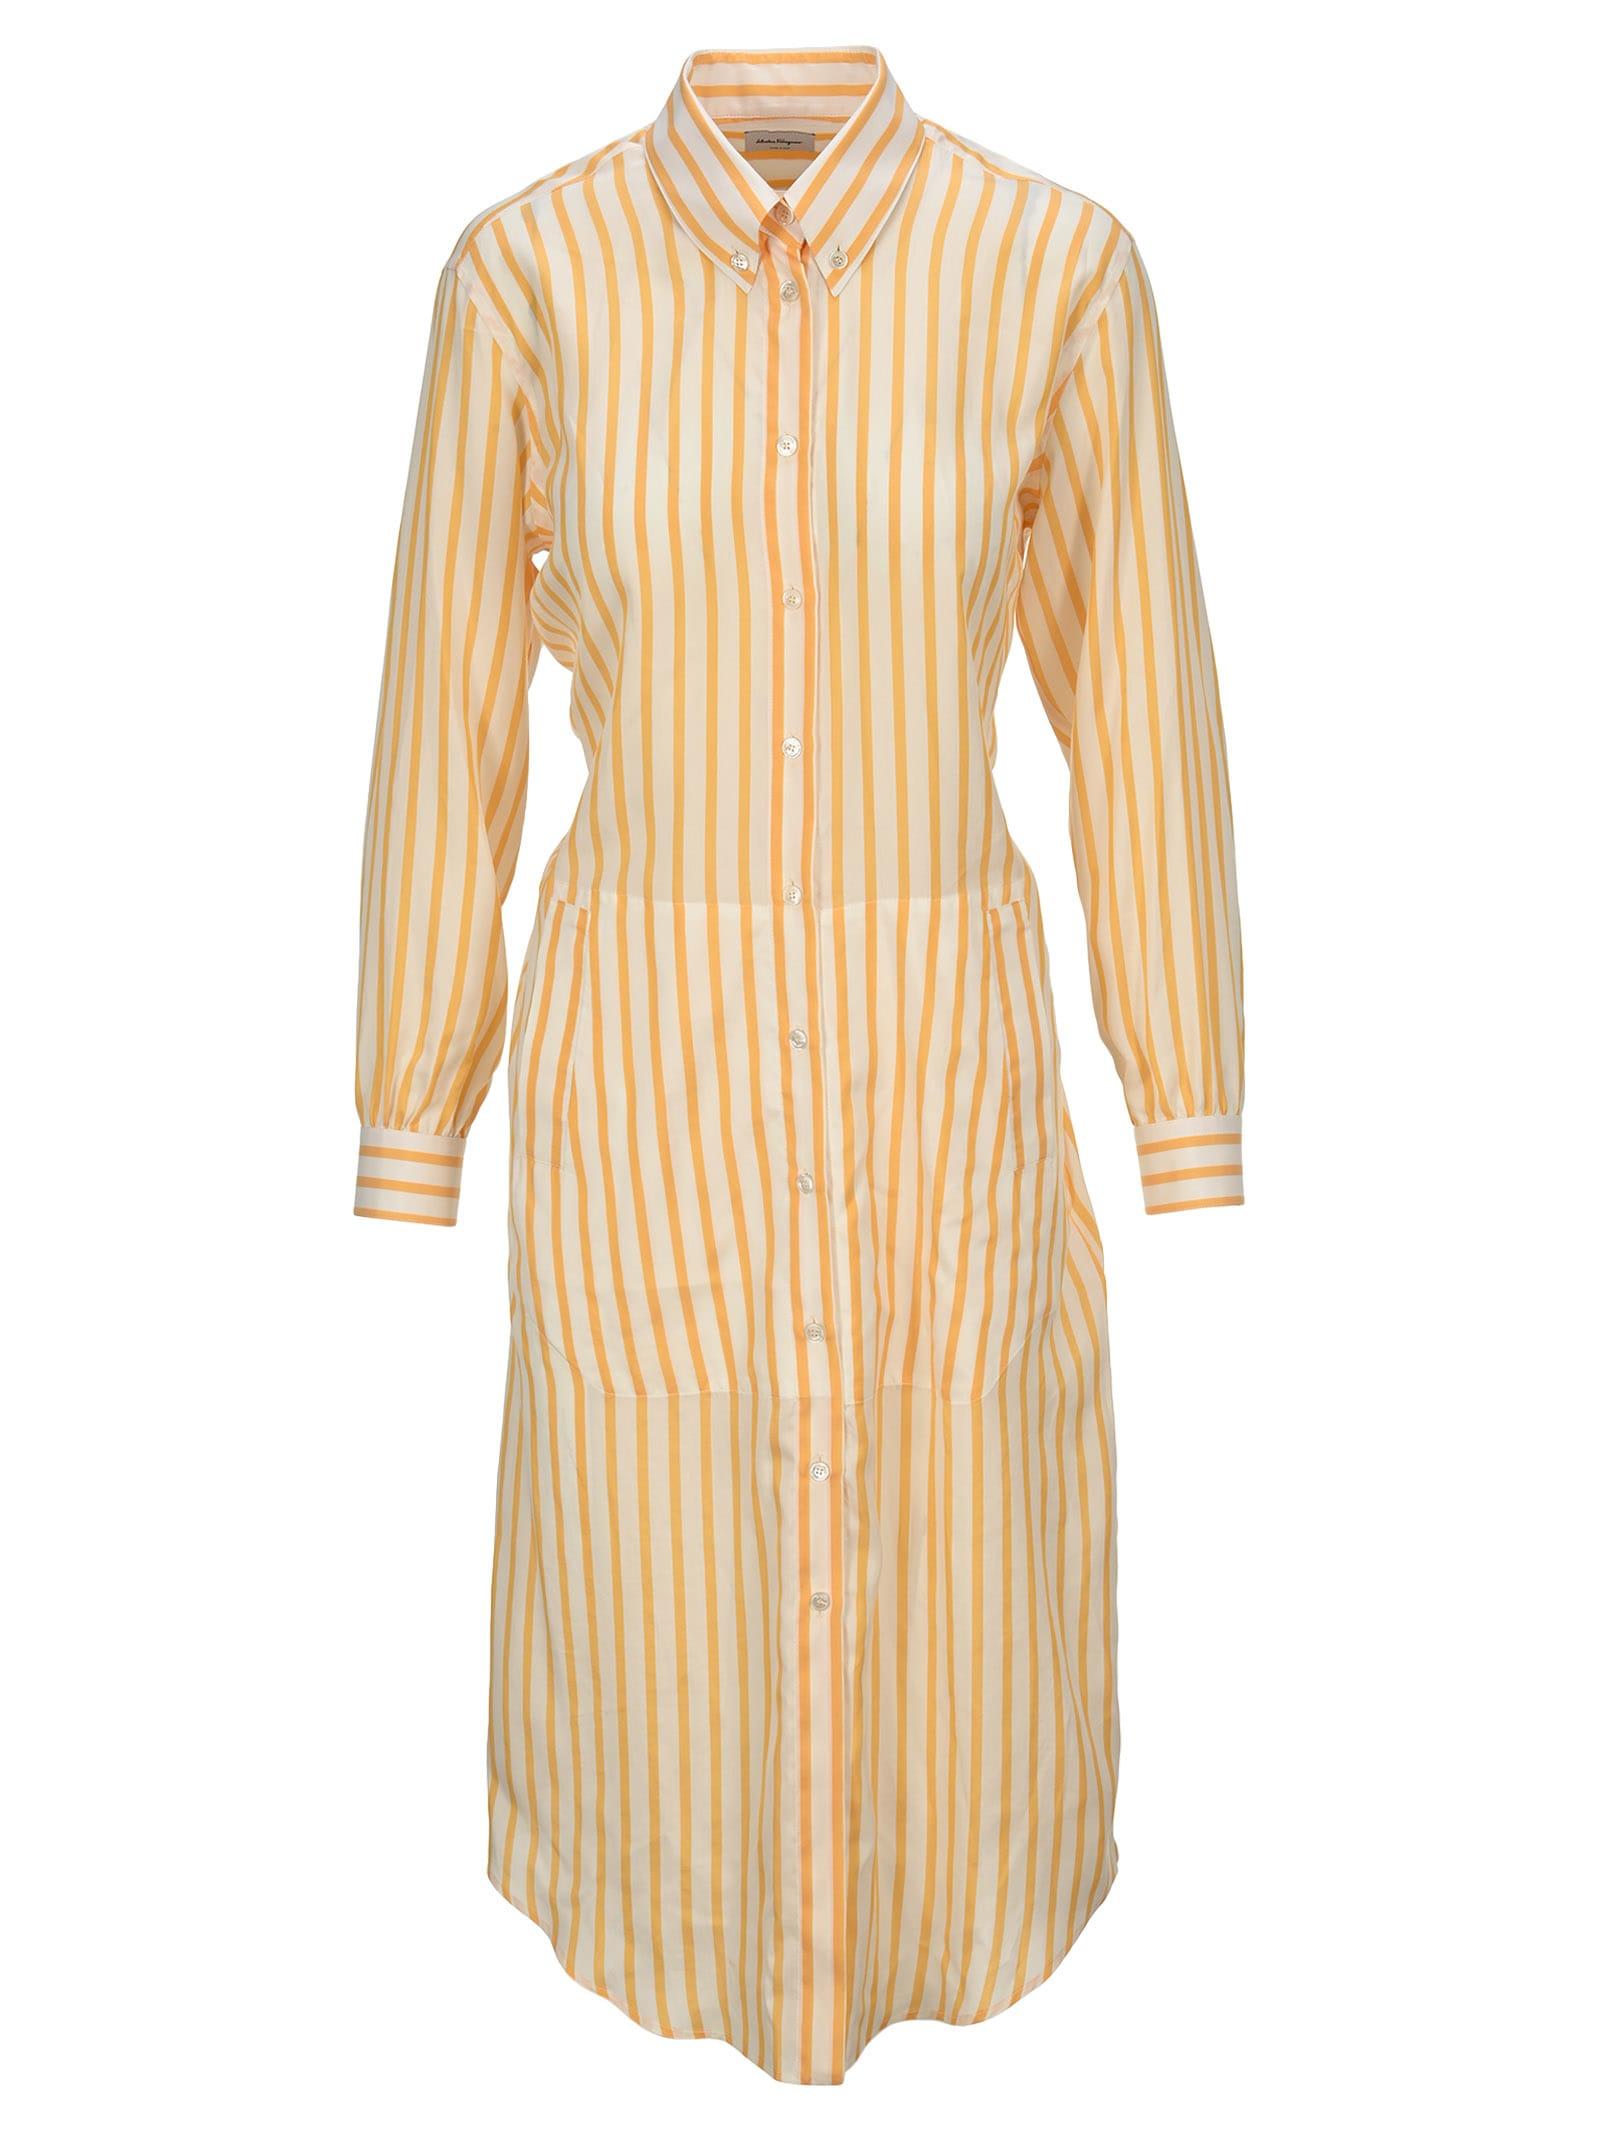 Buy Salvatore Ferragamo Striped Shirt Dress online, shop Salvatore Ferragamo with free shipping